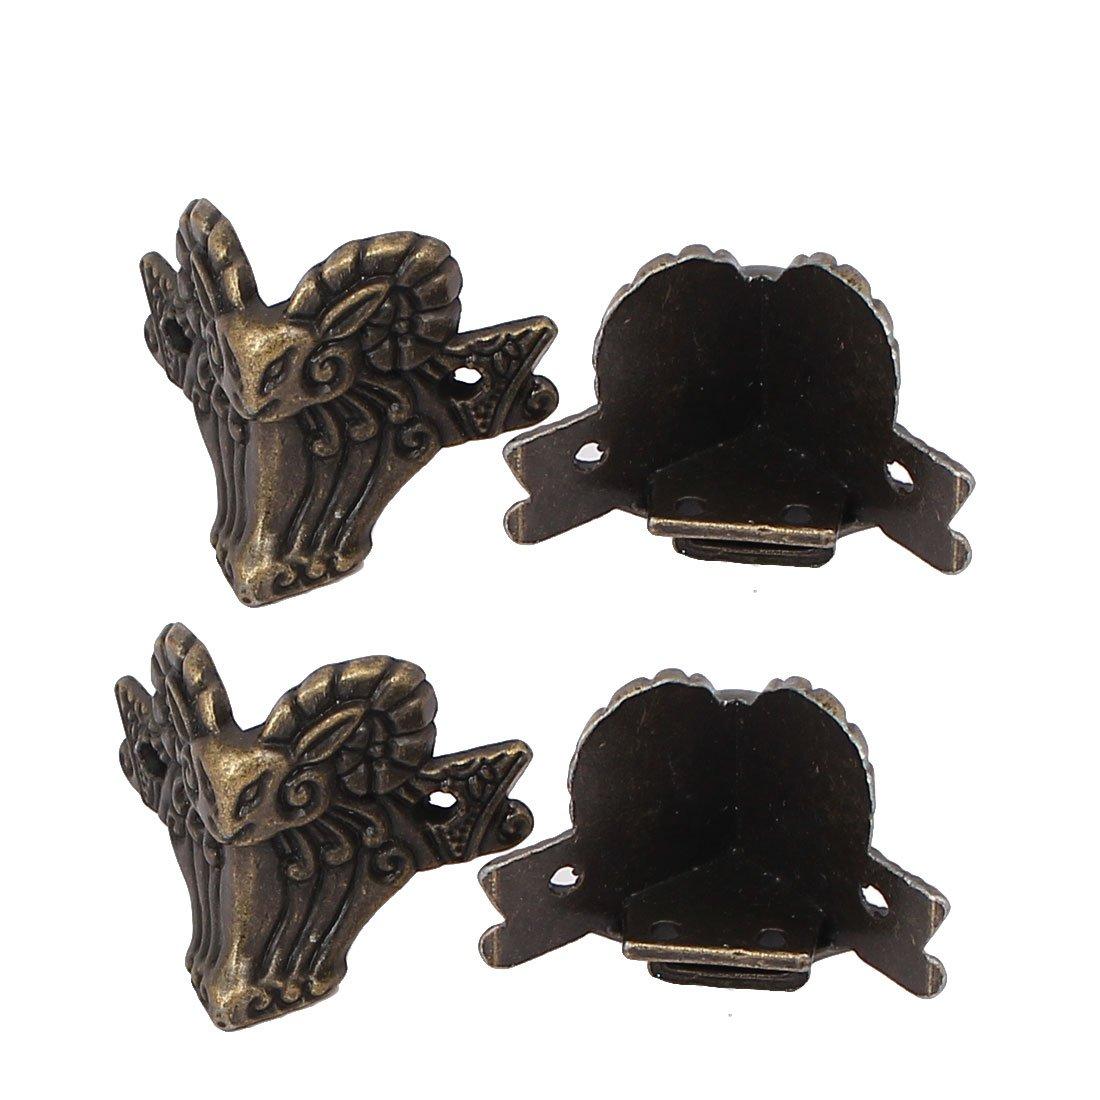 uxcellGift Box Jewelry Case Photo Frame Metal Ram Shape Corner Protector Bronze Tone 4pcs a16092600ux0543